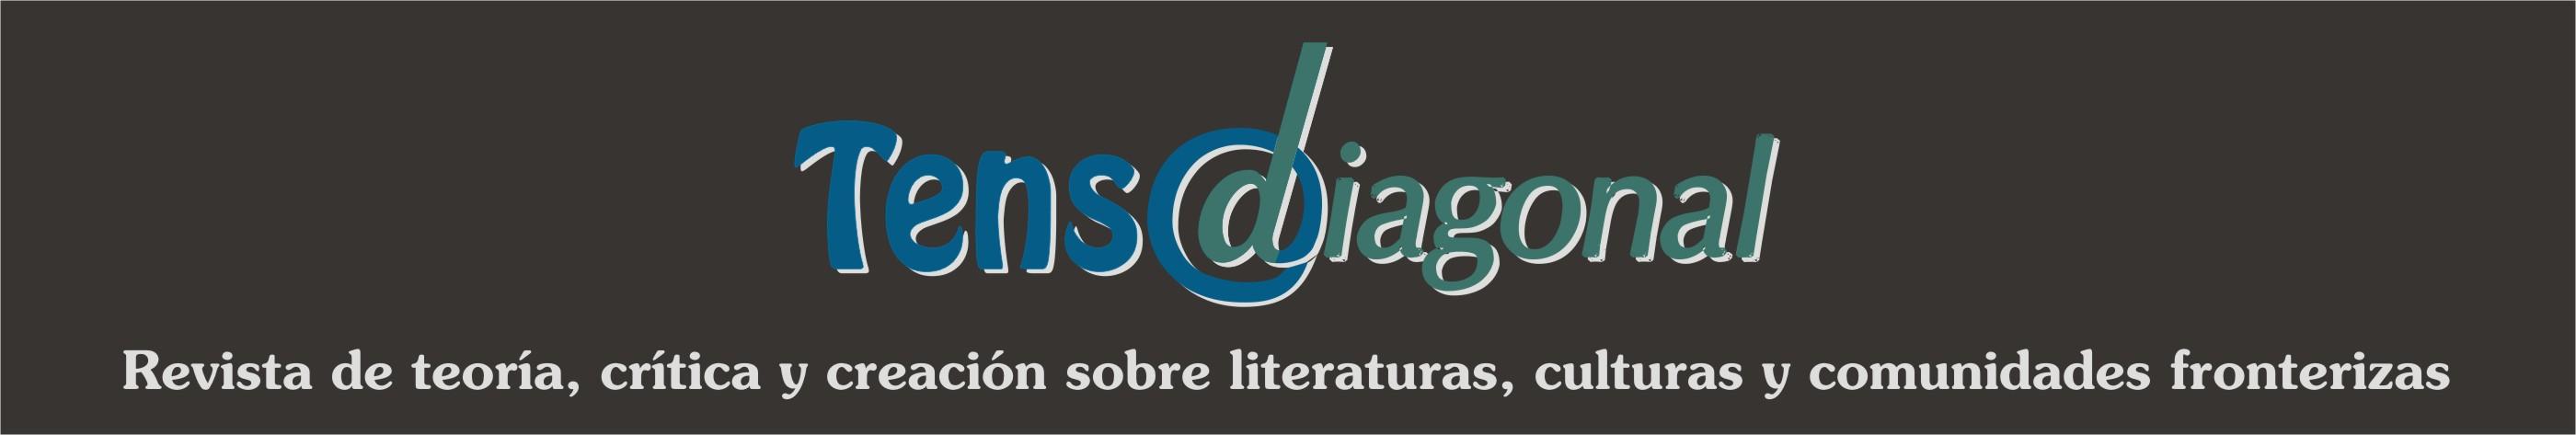 Convocatoria Revista Tenso Diagonal, Número 05